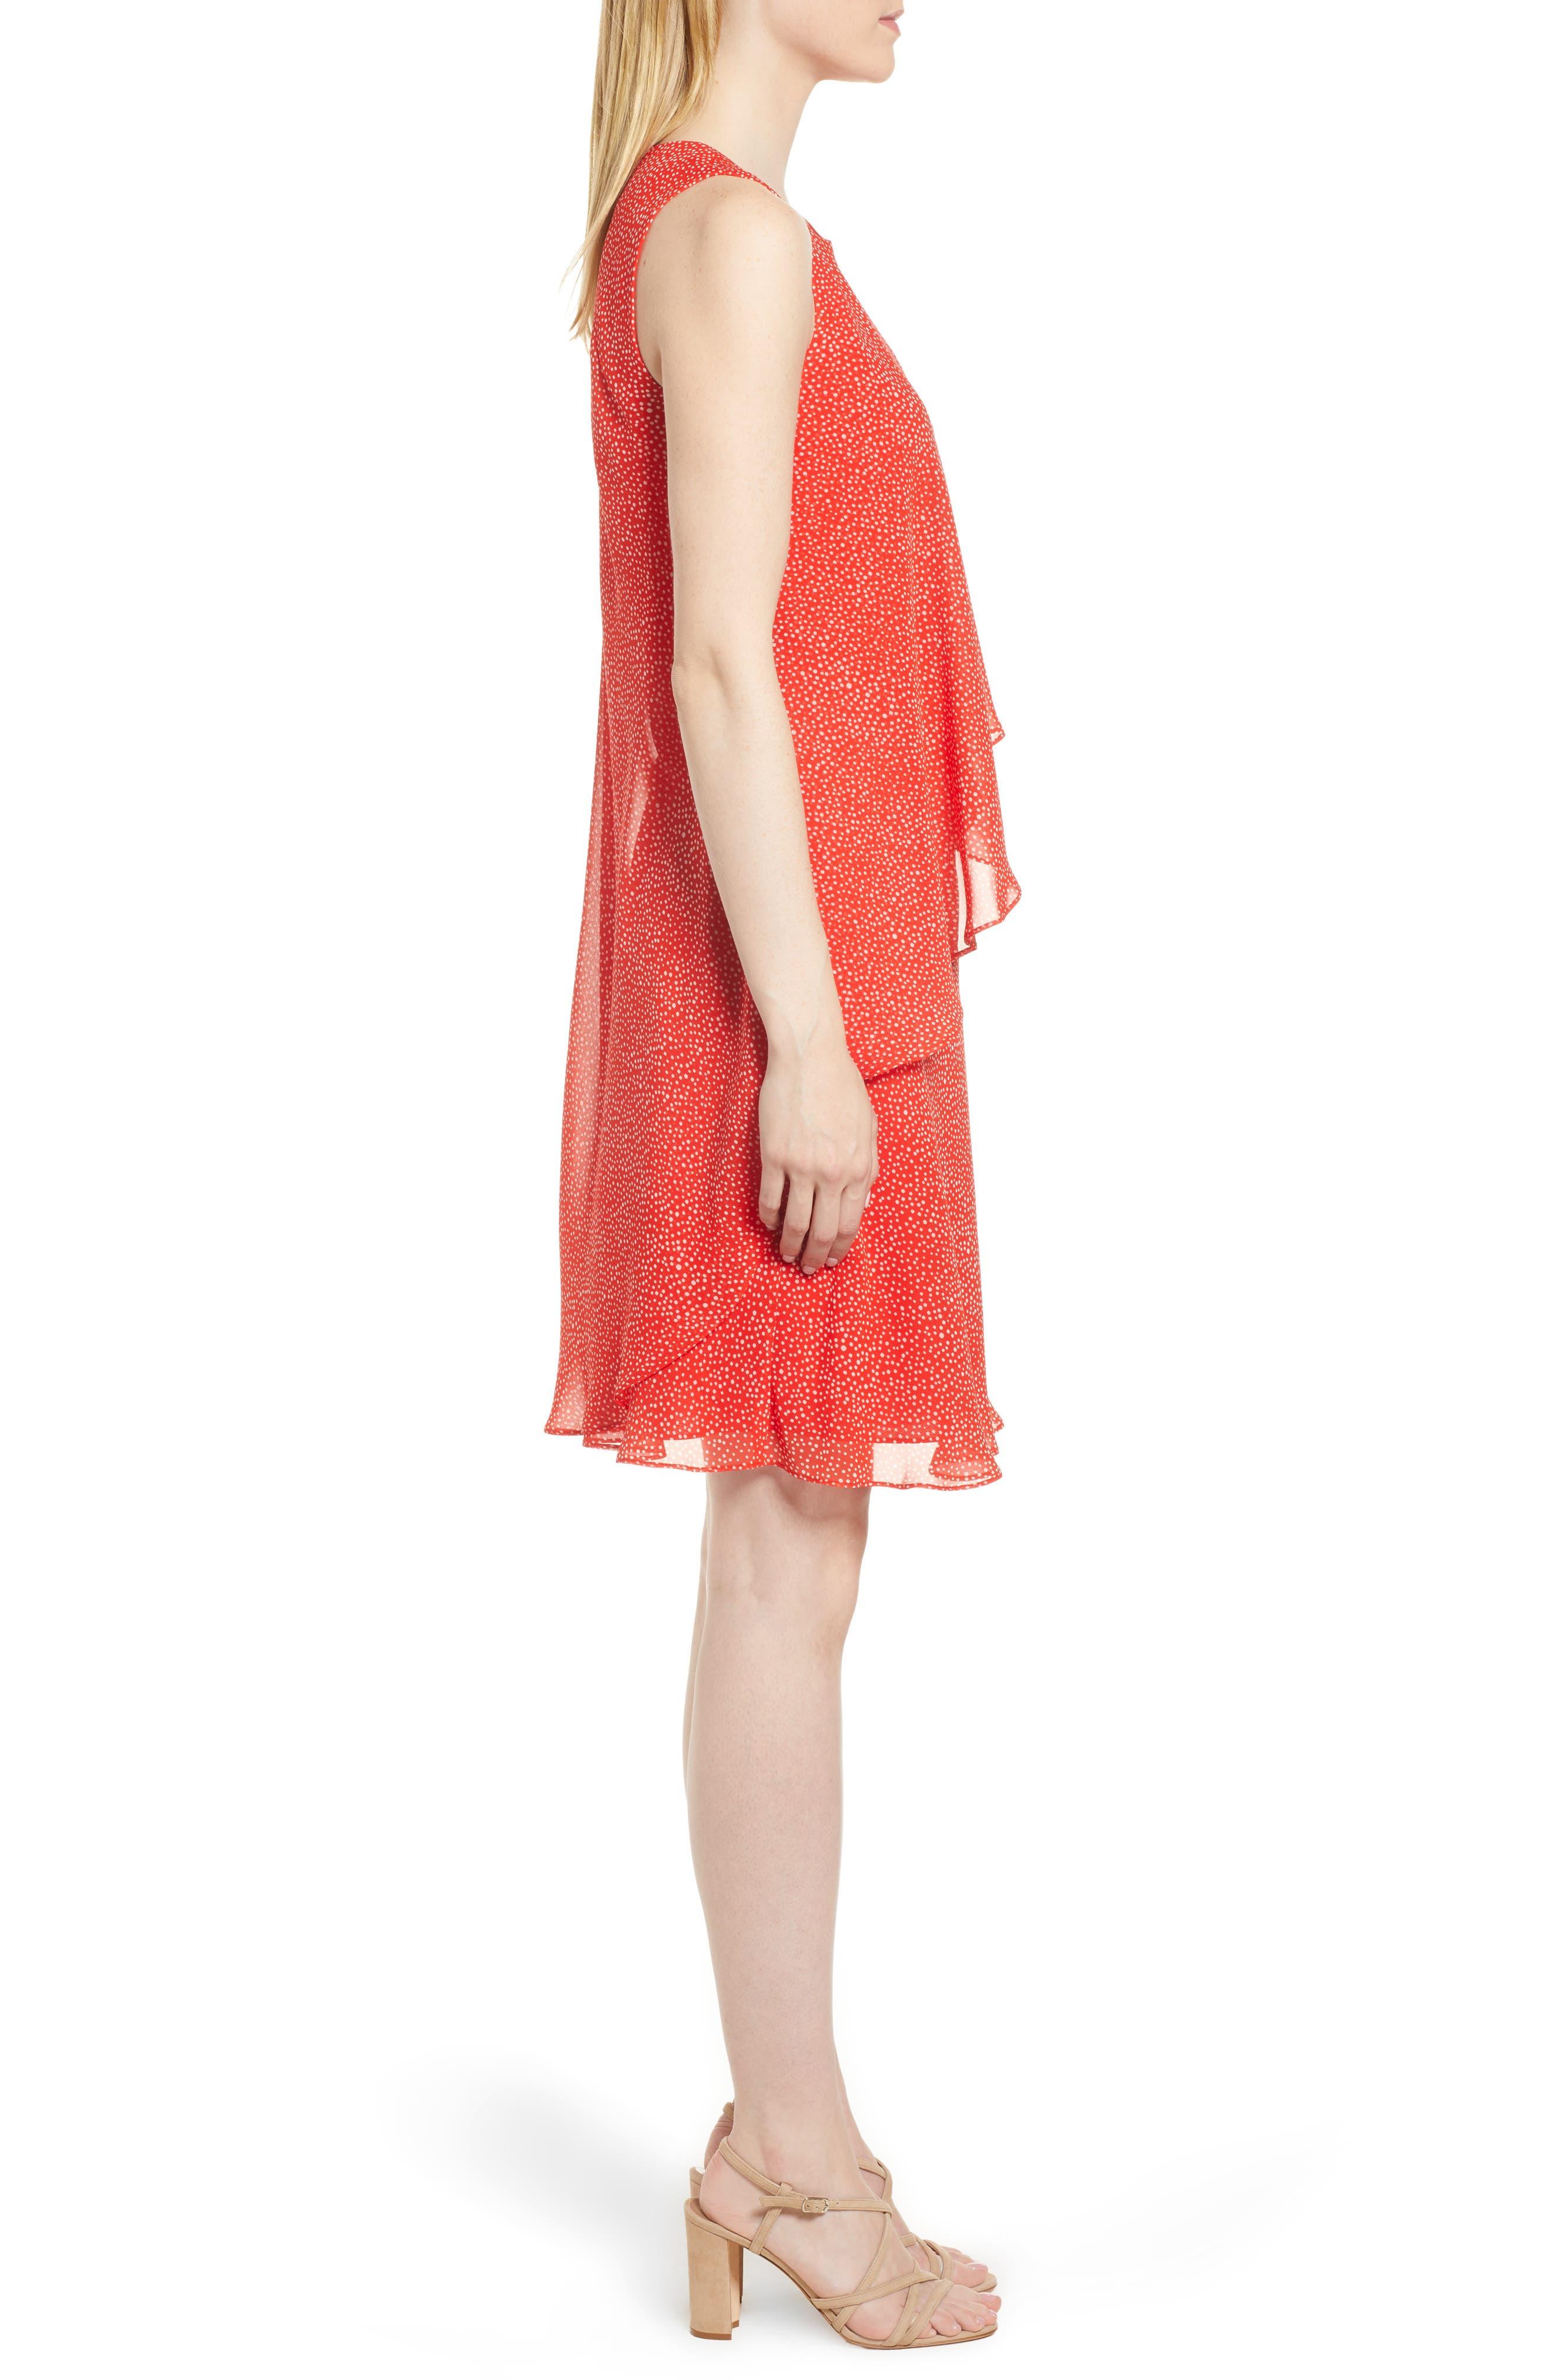 Chiffon Overlay A-Line Dress,                             Alternate thumbnail 3, color,                             Tomato/ White